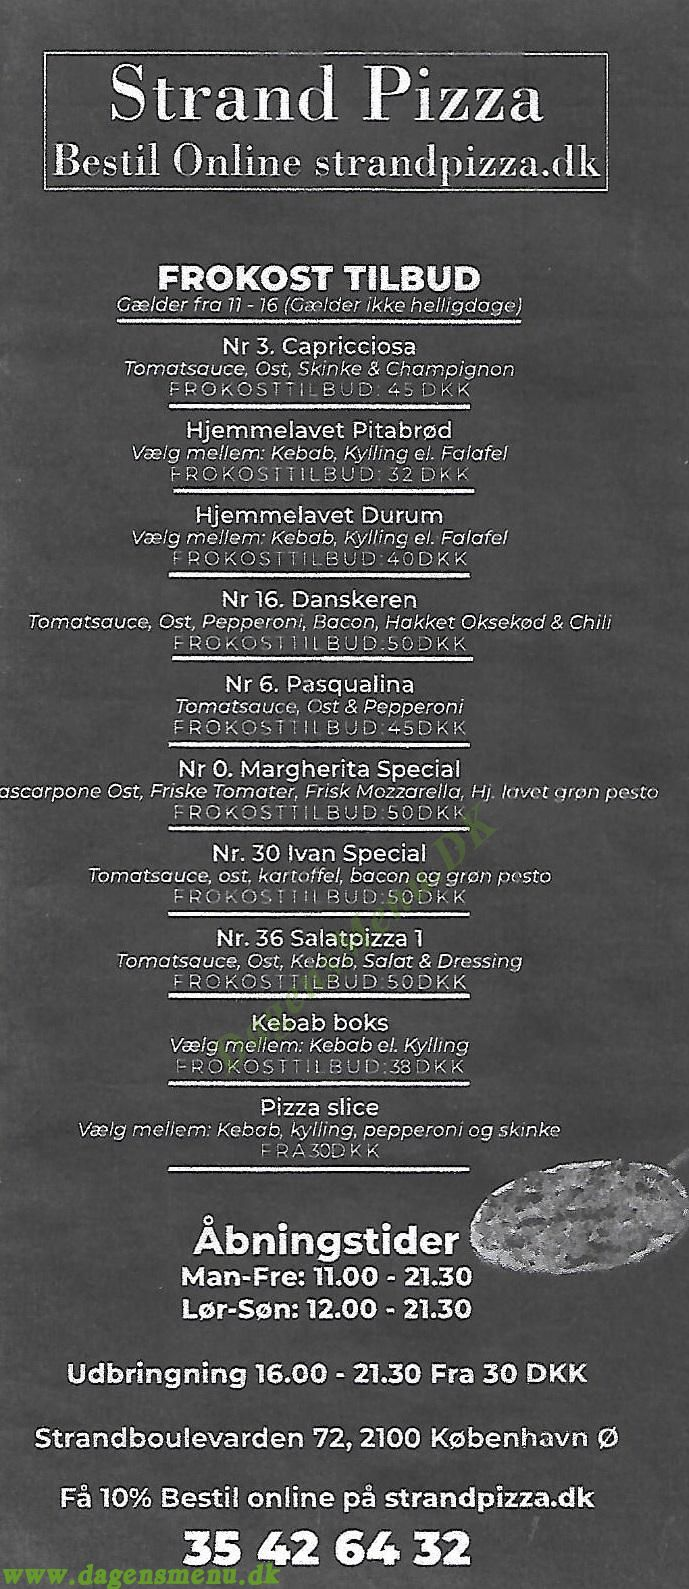 Strand Pizza - Menukort